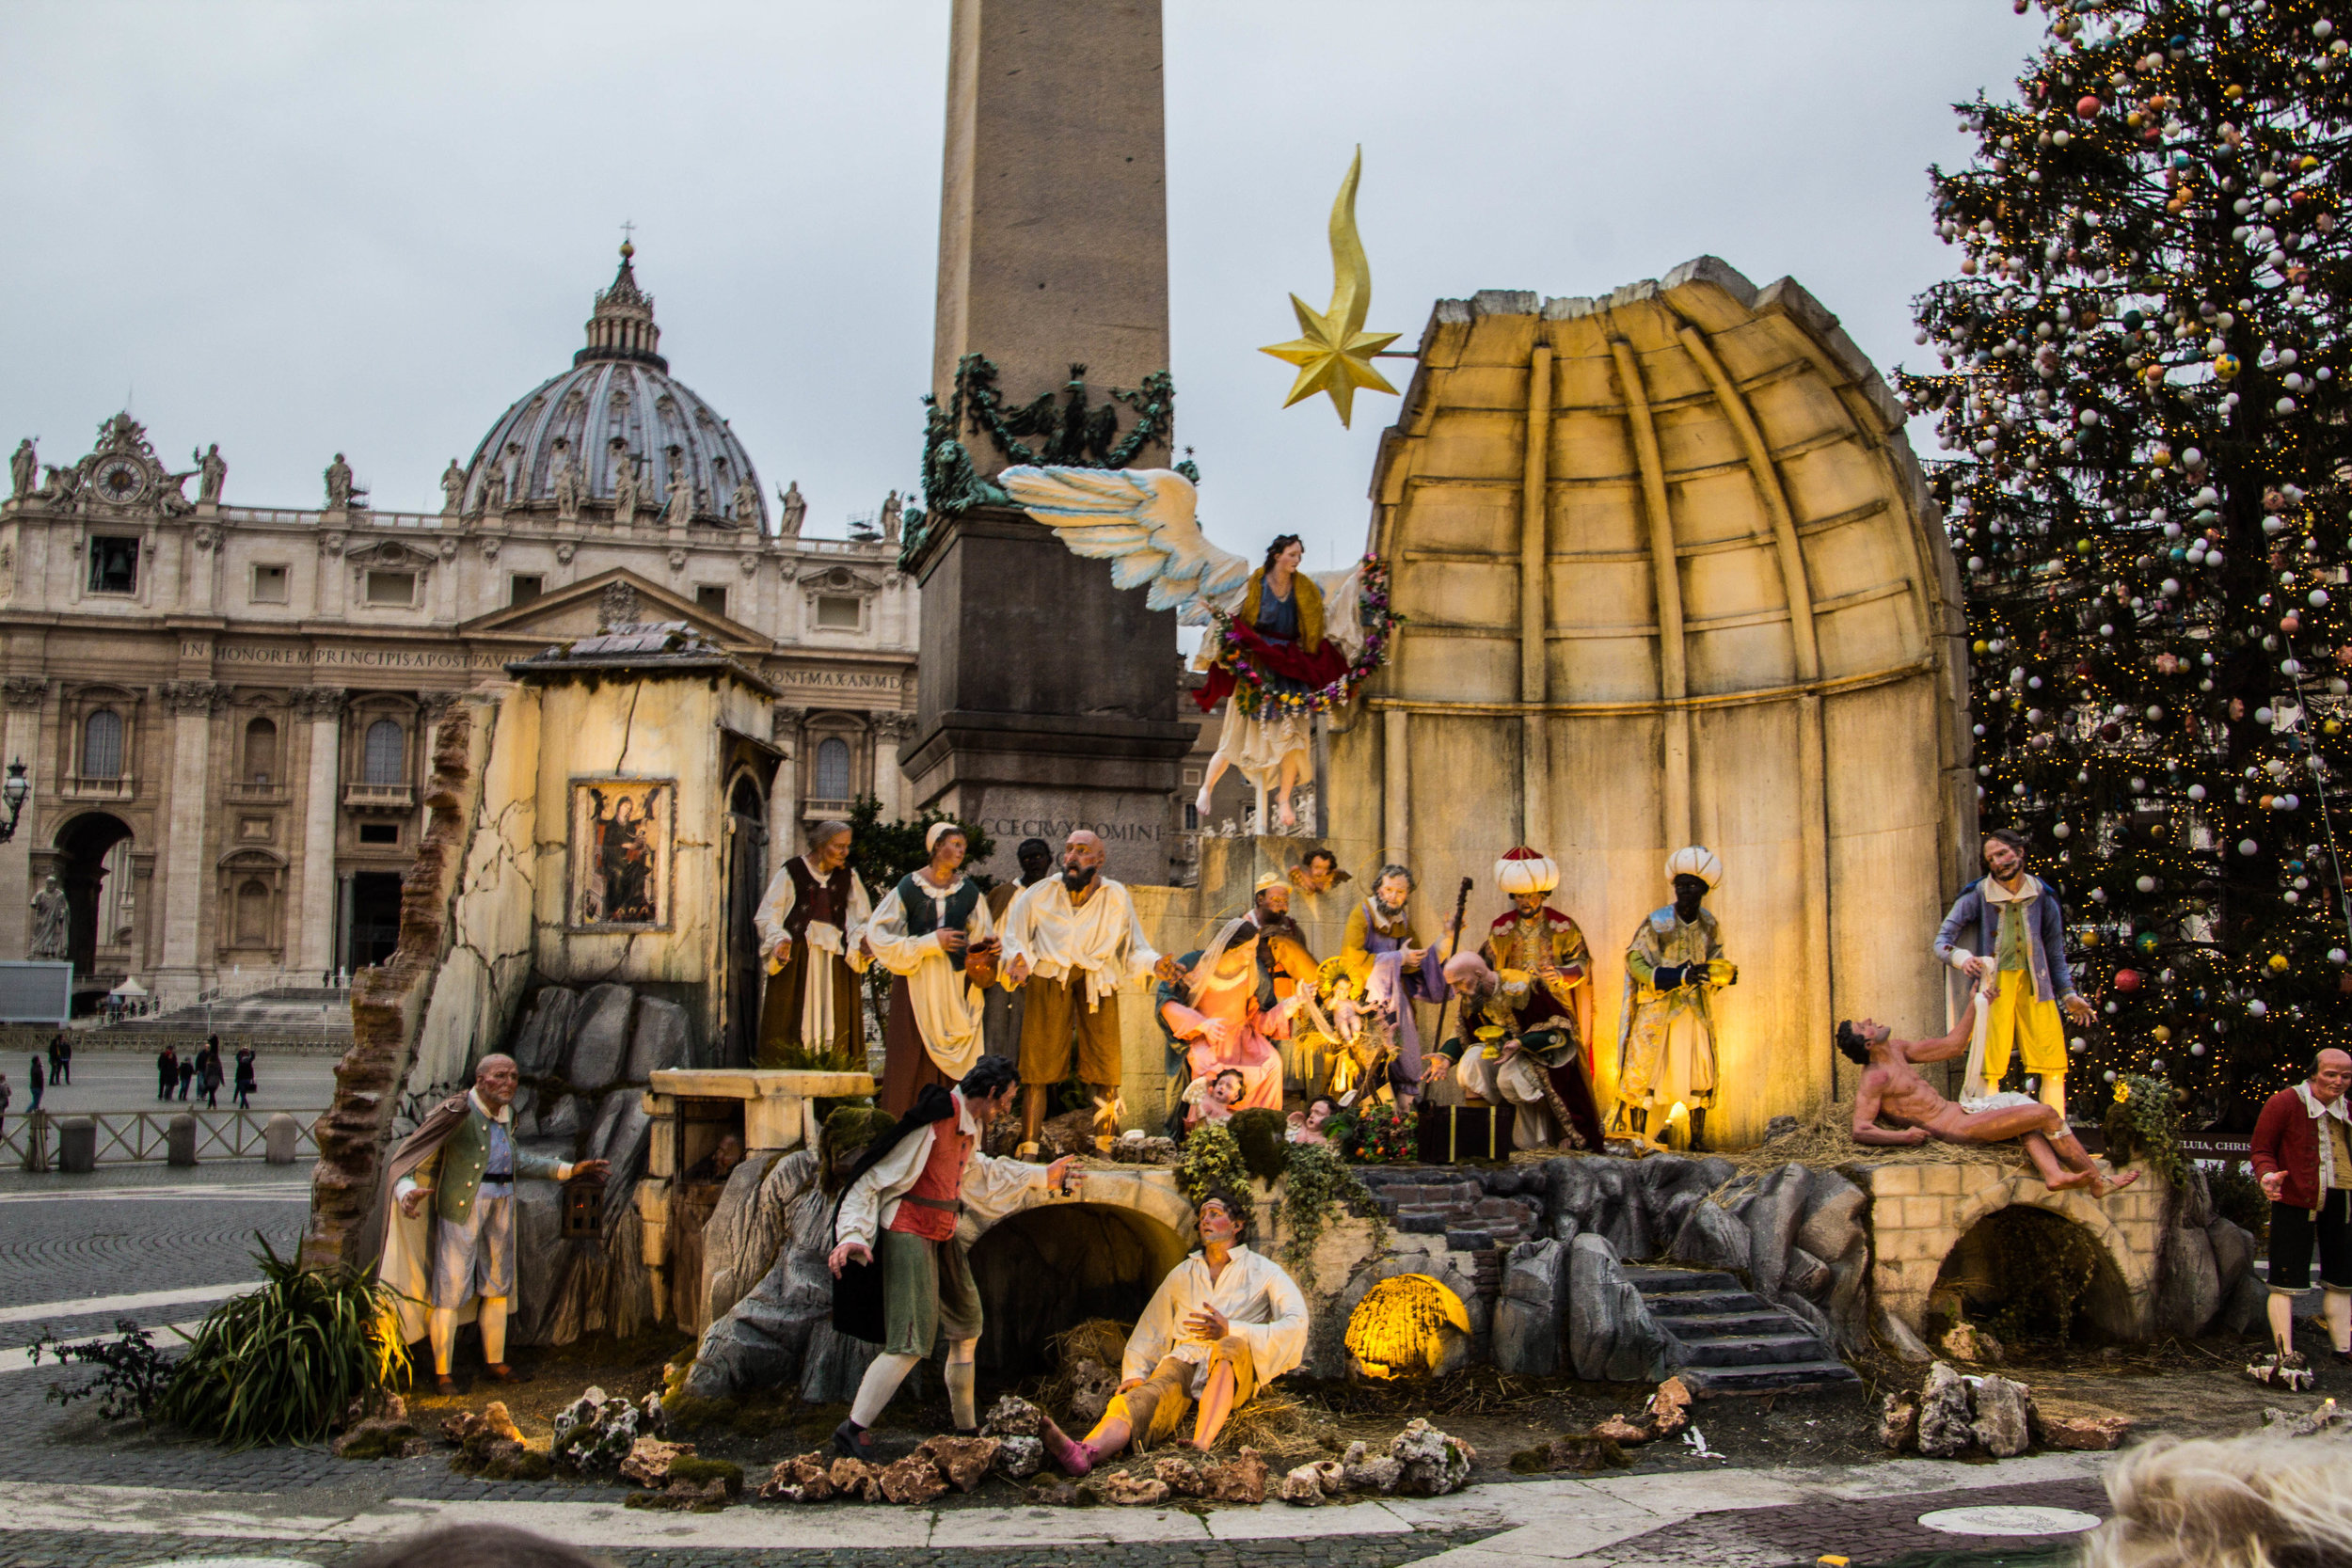 vatican-city-rome-italy-10.jpg